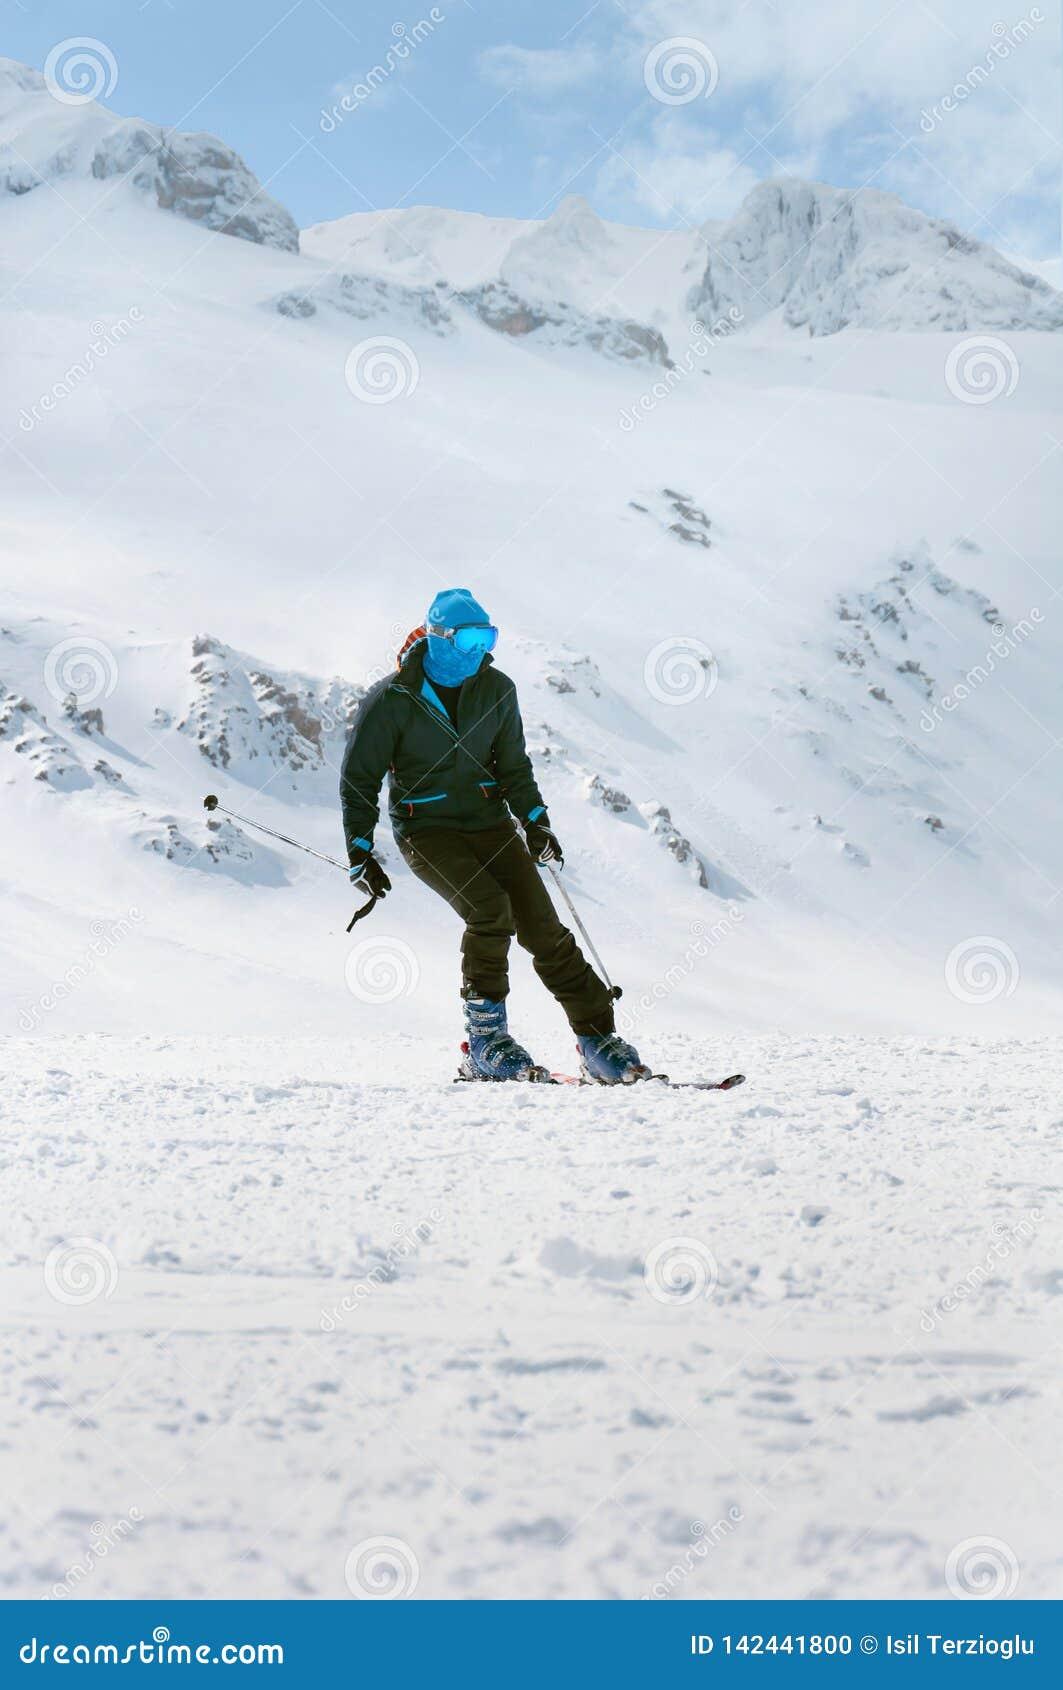 Extreme wintersporten Mensenskiër die neer in hoog bevroren bergen ski?en